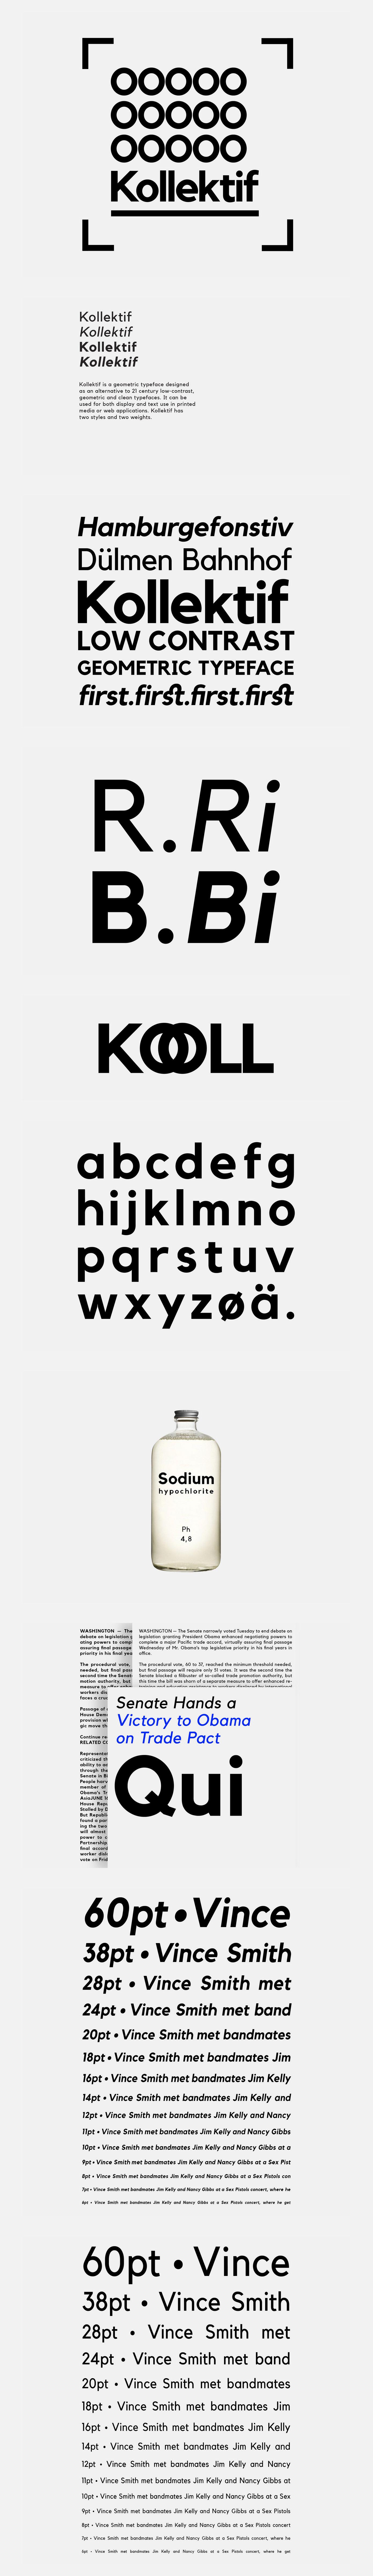 Kollektif Typeface I Free on Behance